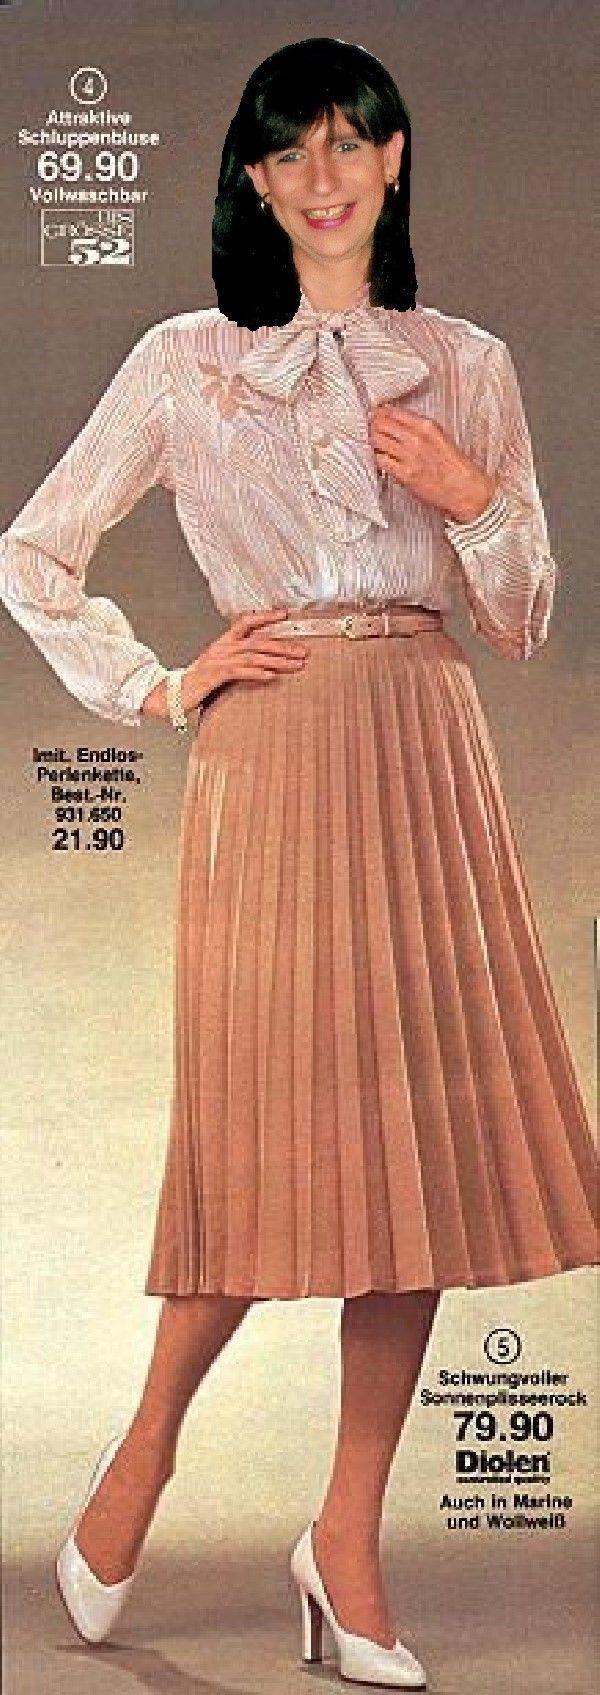 Pleats faltenrock martina in foreign pictures 2 pinterest bluse faltenrock und 80er mode - 80er damenmode ...